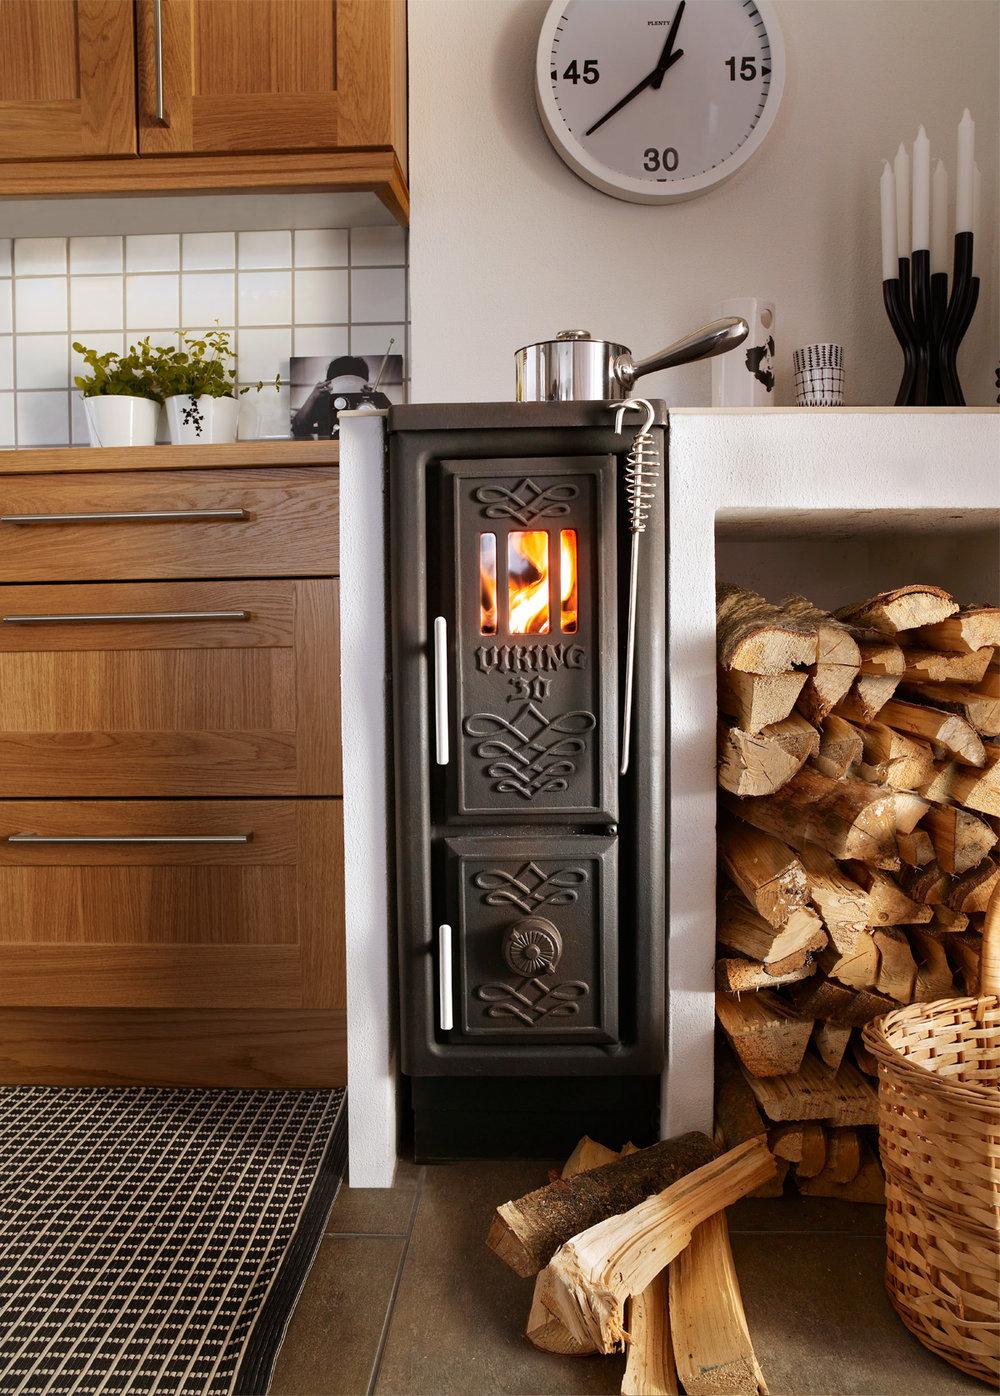 Josef Davidsons Viking 30 wood stove Front l Tiny Wood Stove l Tiny Life Supply.jpg